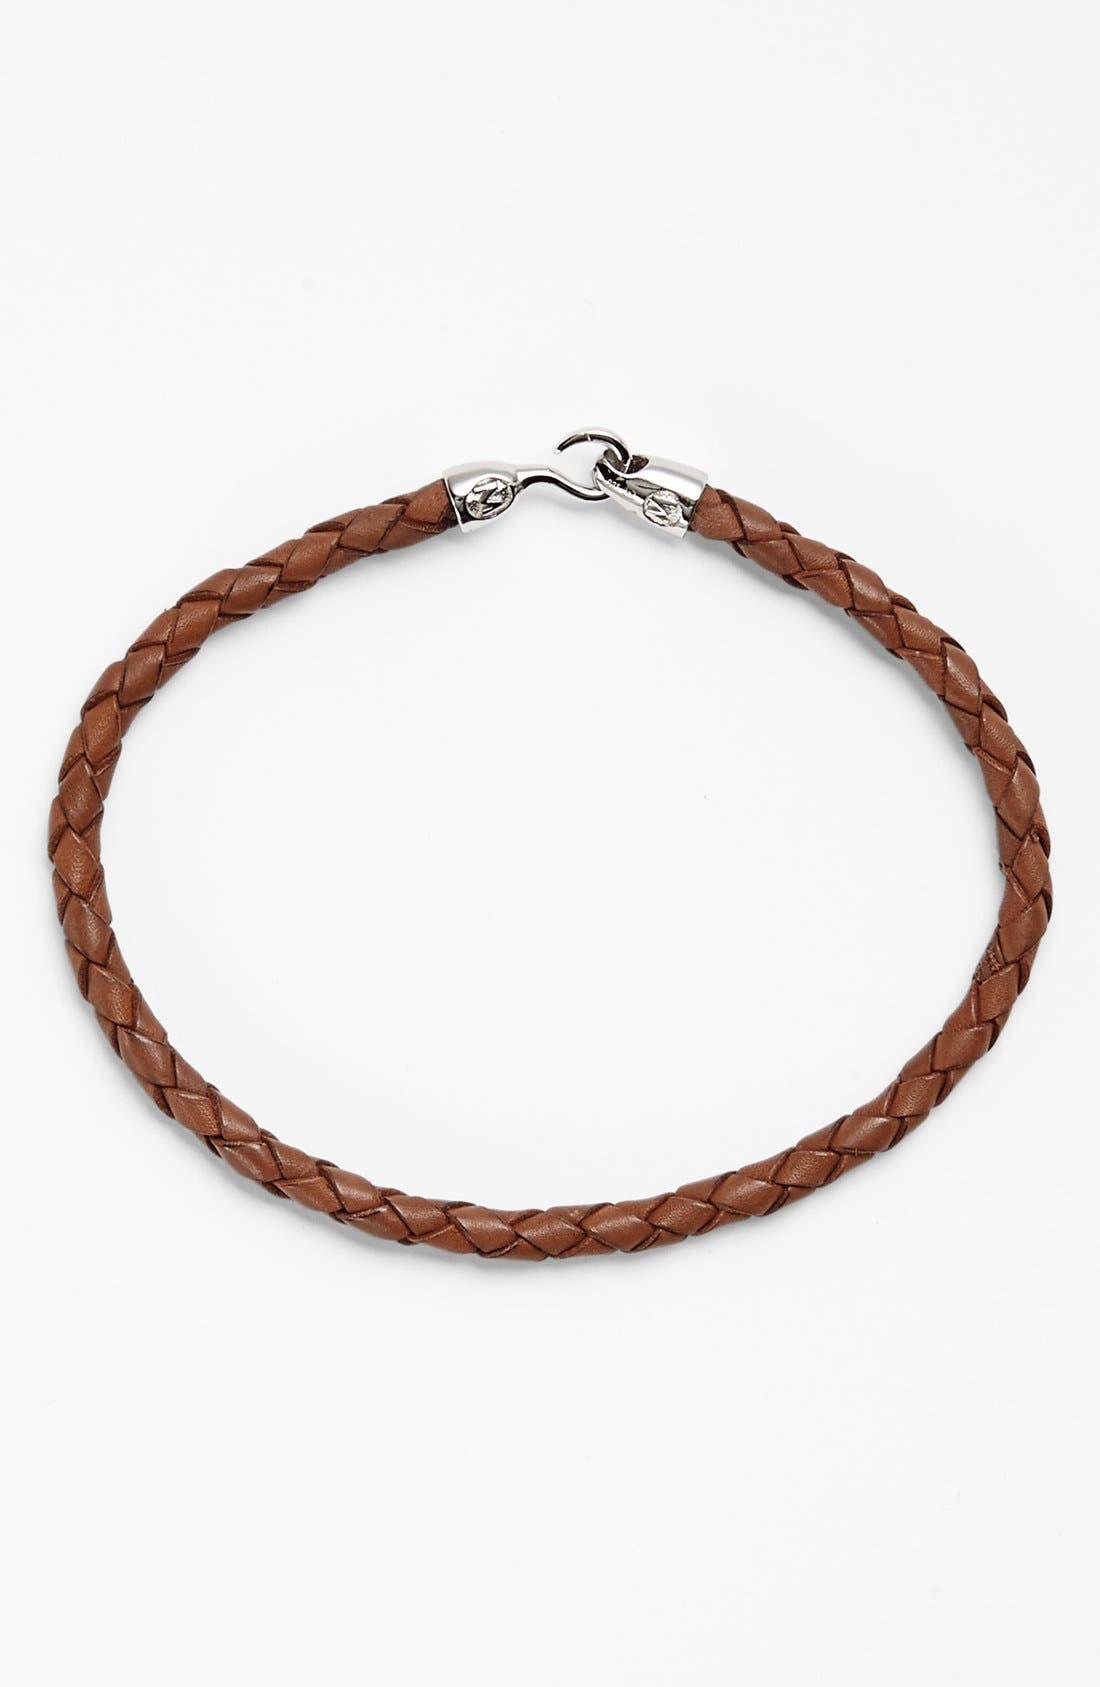 Main Image - Mateo Bijoux 'Greek' Braided Leather Bracelet